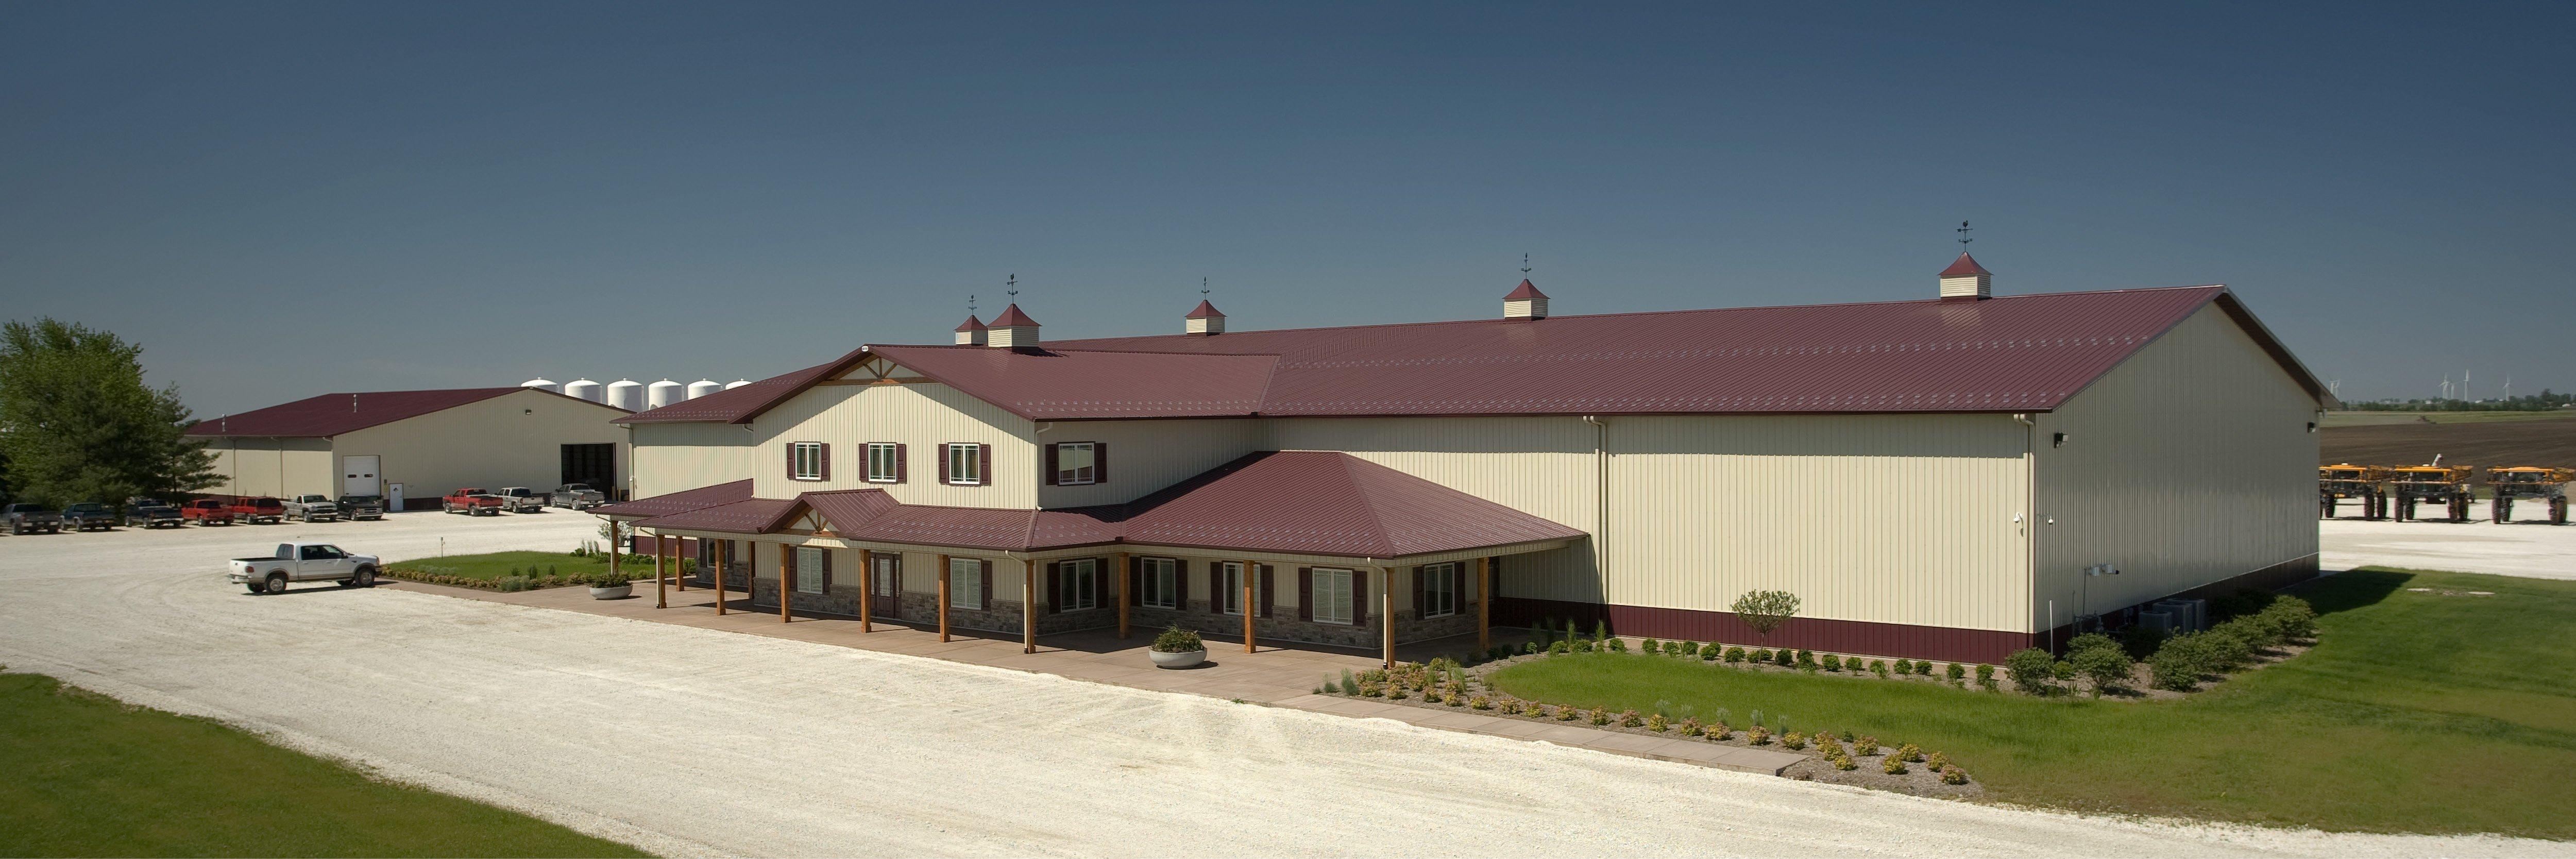 Our Top 5: Farm Shop and Machine Storage Pole Barns